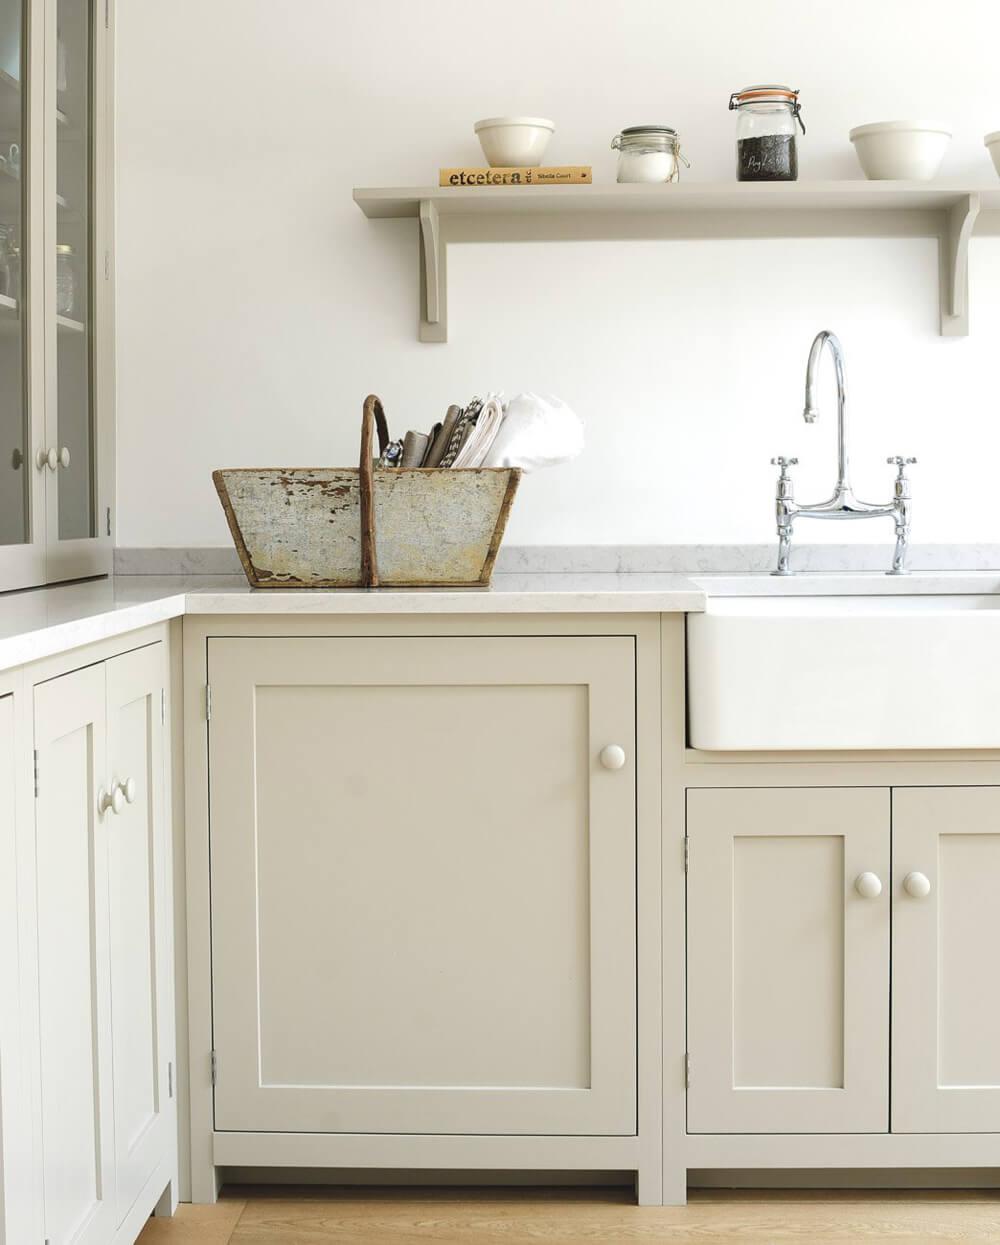 forthehome+kitchen+cabinet+door+styles.jpg